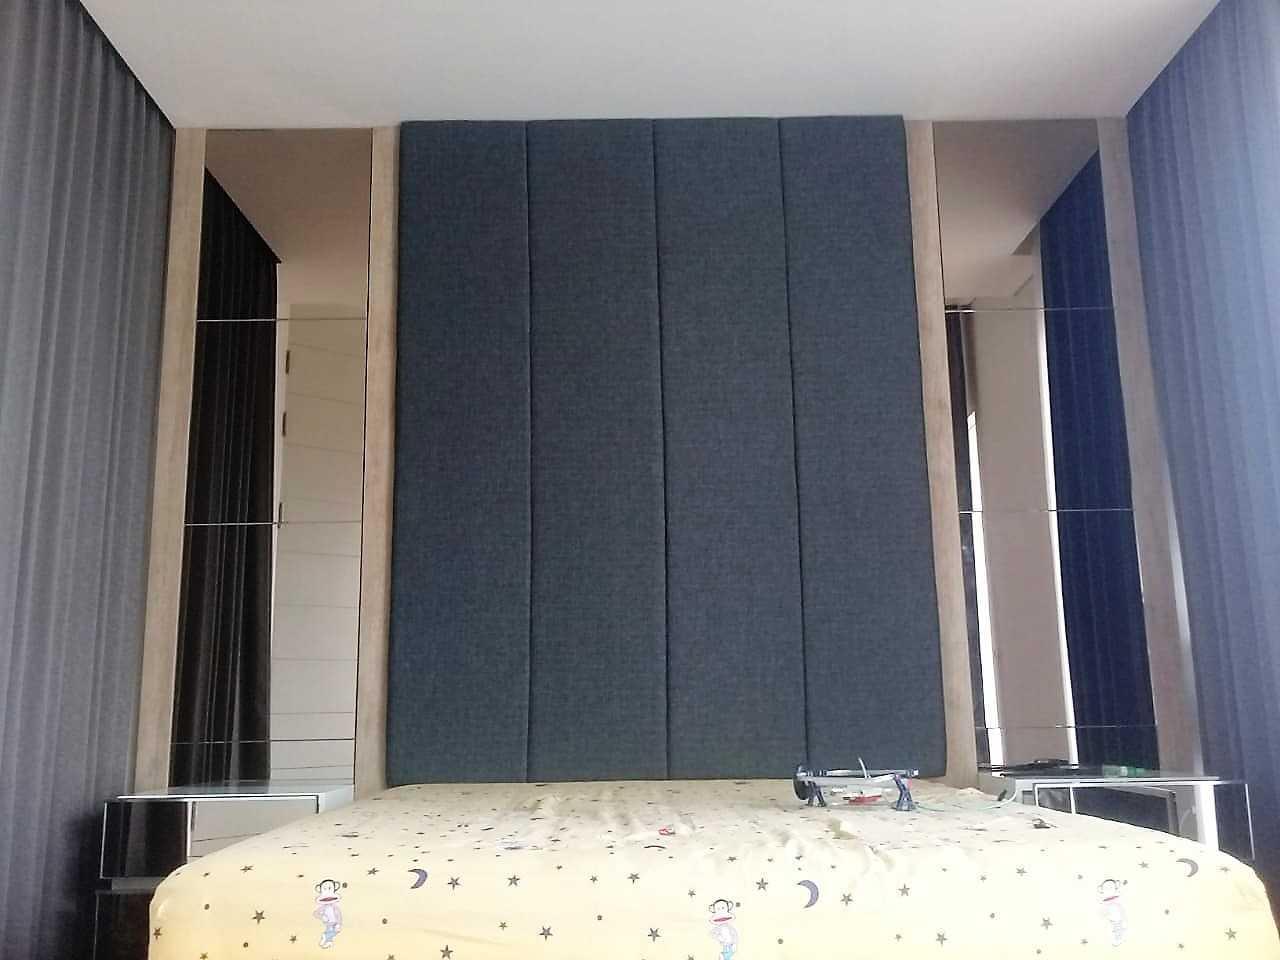 Aditya Wira Hardi Modern Master Bedroom, Medokan Surabaya Surabaya, Kota Sby, Jawa Timur, Indonesia Surabaya, Kota Sby, Jawa Timur, Indonesia Aditya-Wira-Hardi-Modern-Master-Bedroom-Medokan-Surabaya   65951